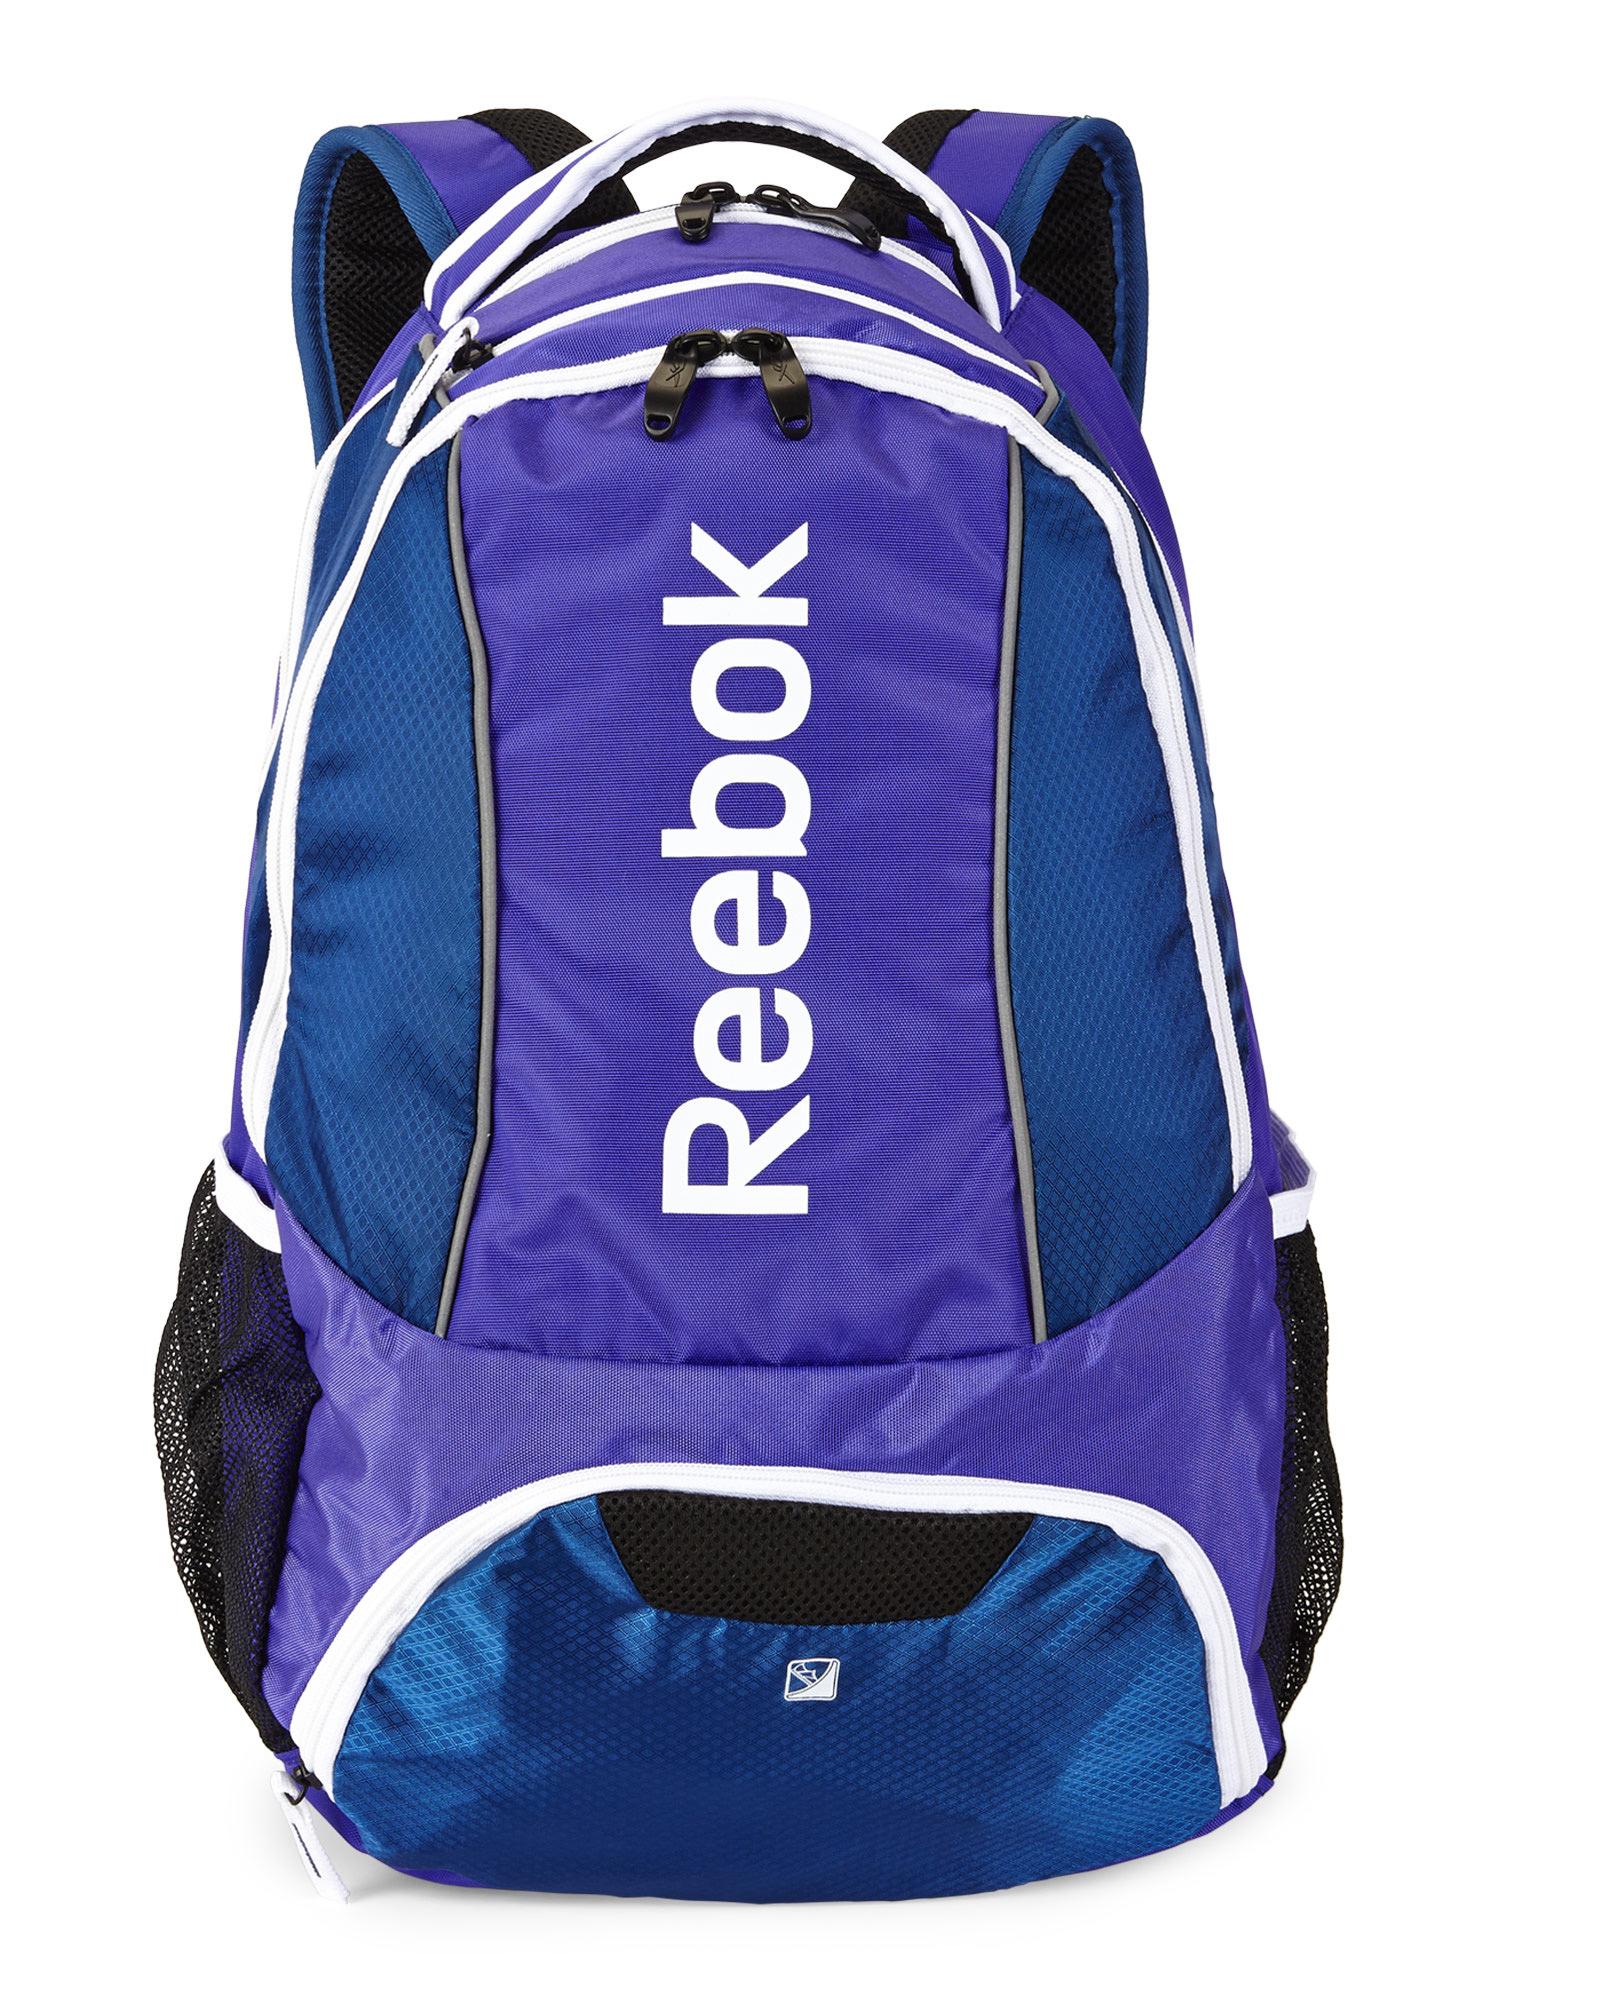 Lyst - Reebok Purple & Blue Tornado Backpack in Purple  |Reebok Backpack